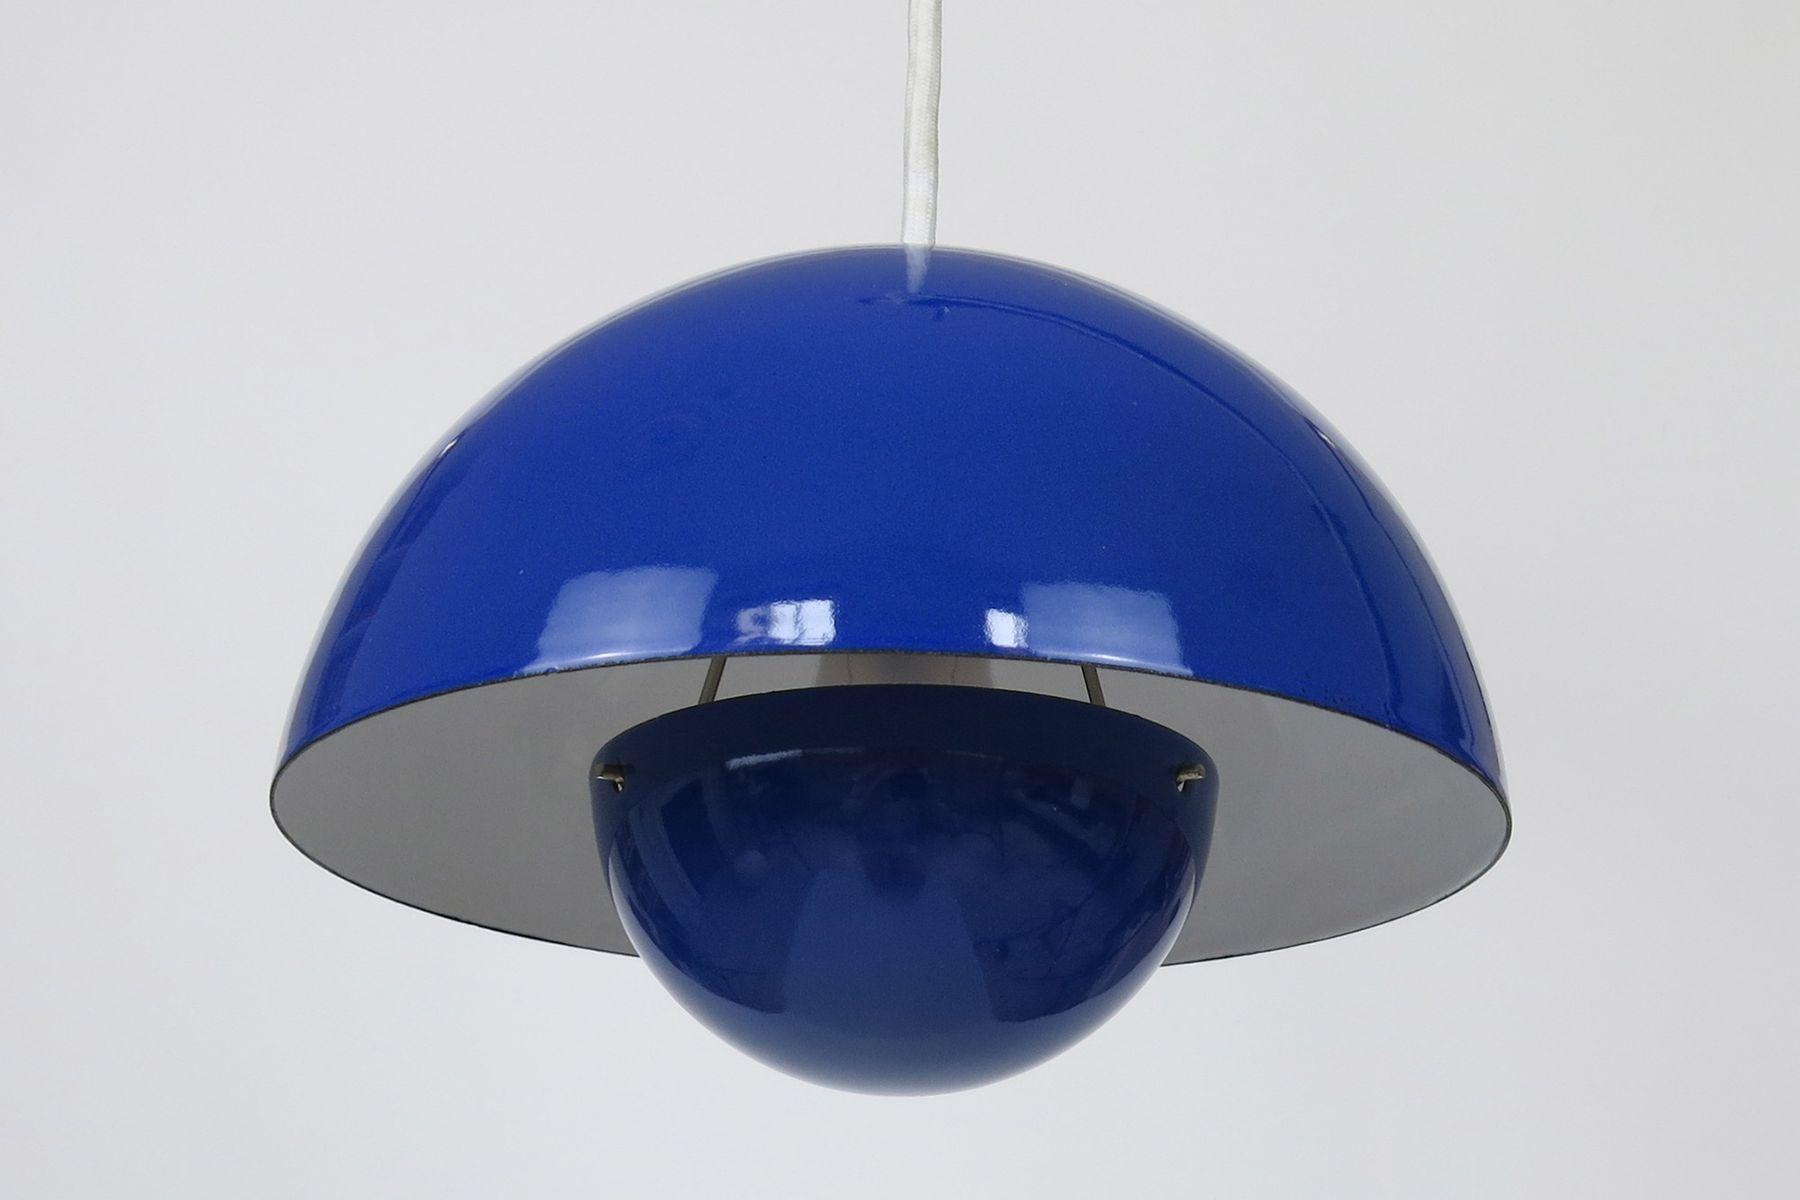 Blue Flowerpot Pendant Light By Verner Panton For Louis